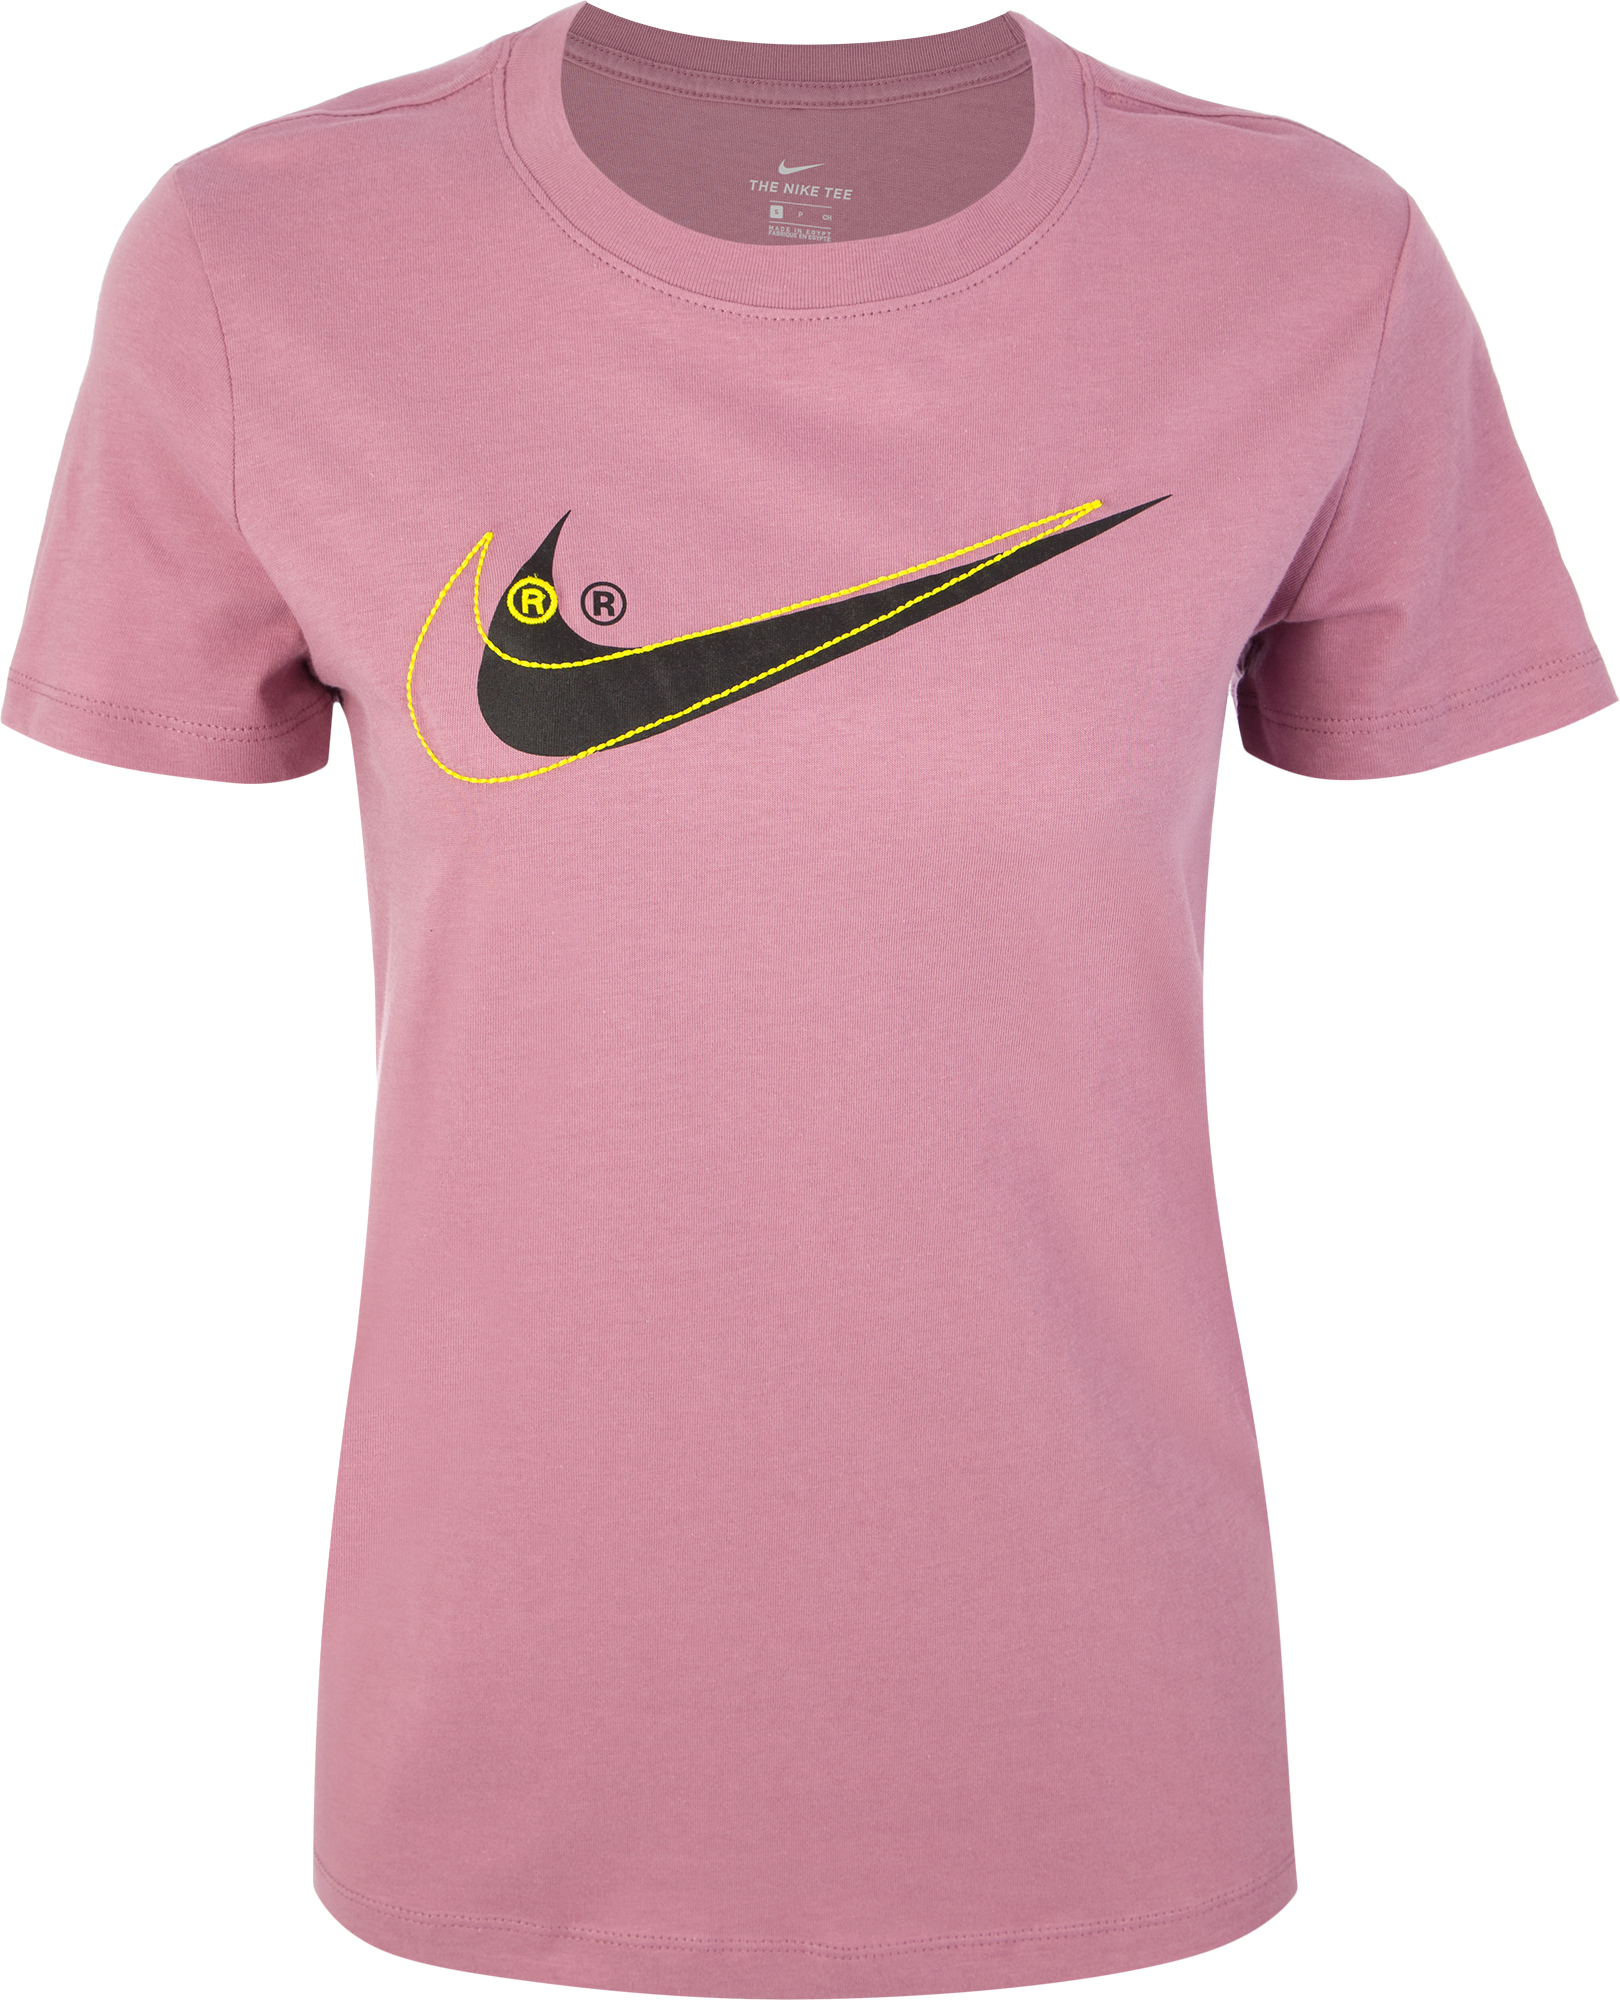 Nike Футболка женская Nike Sportswear, размер 46-48 nike майка женская nike air размер 46 48